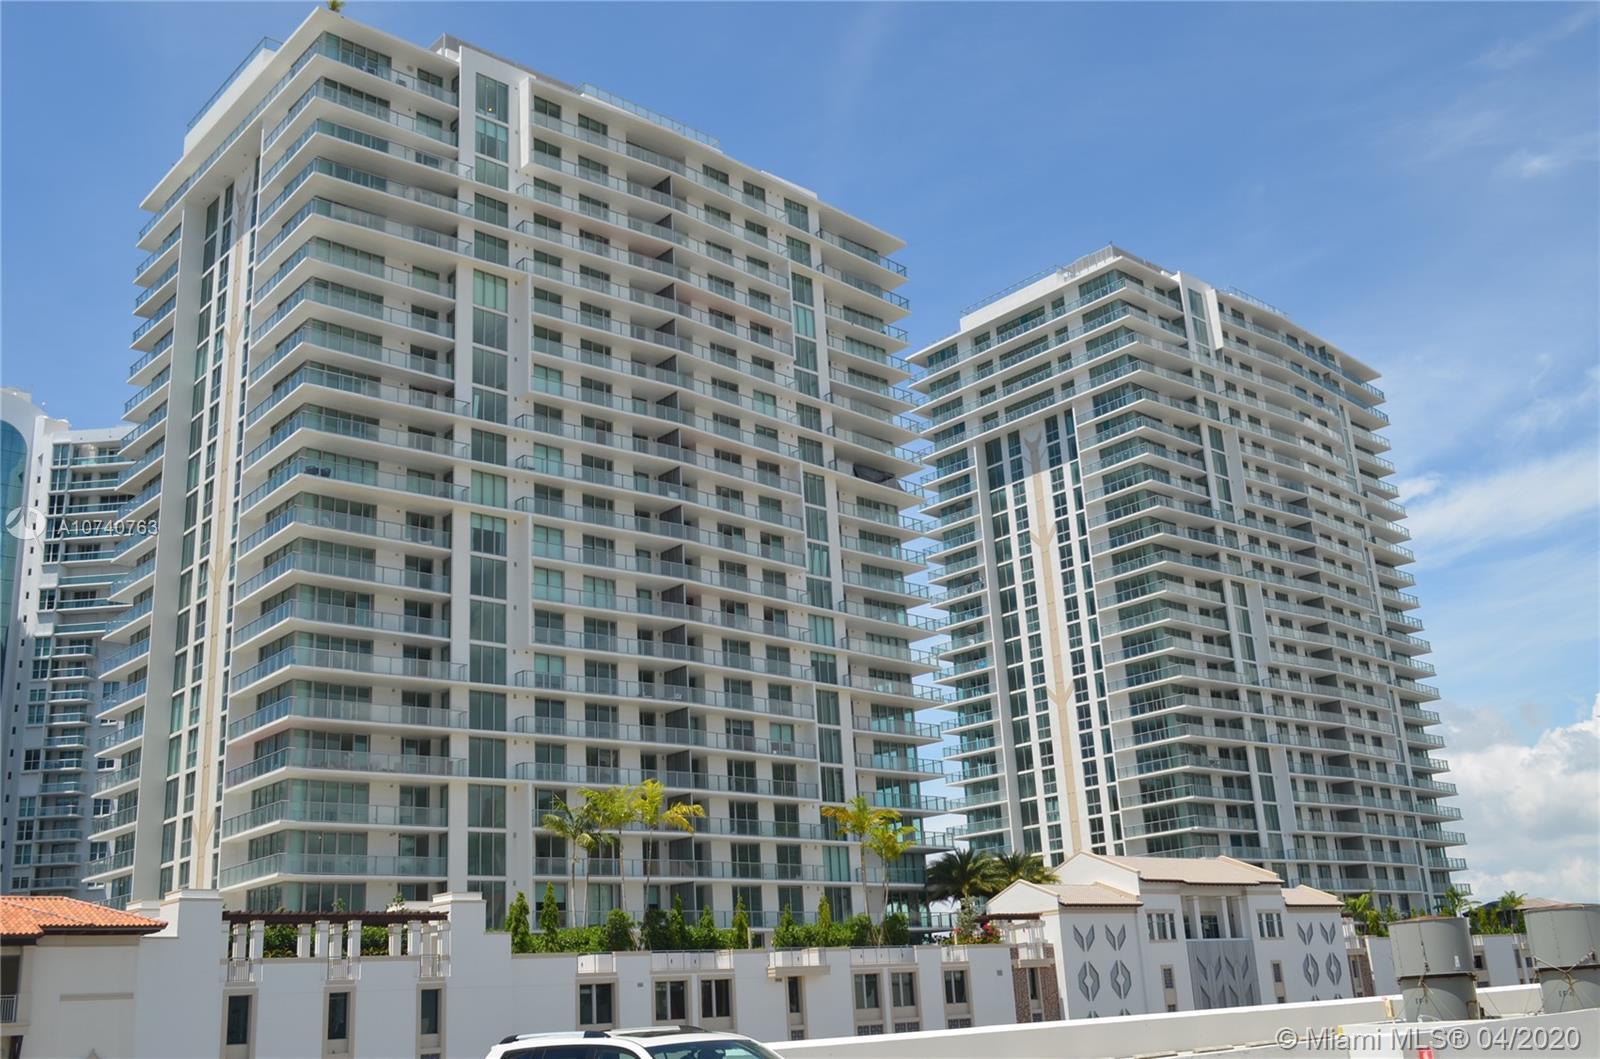 Parque Tower 1 #2502 - 300 Sunny Isles Blvd #2502, Sunny Isles Beach, FL 33160